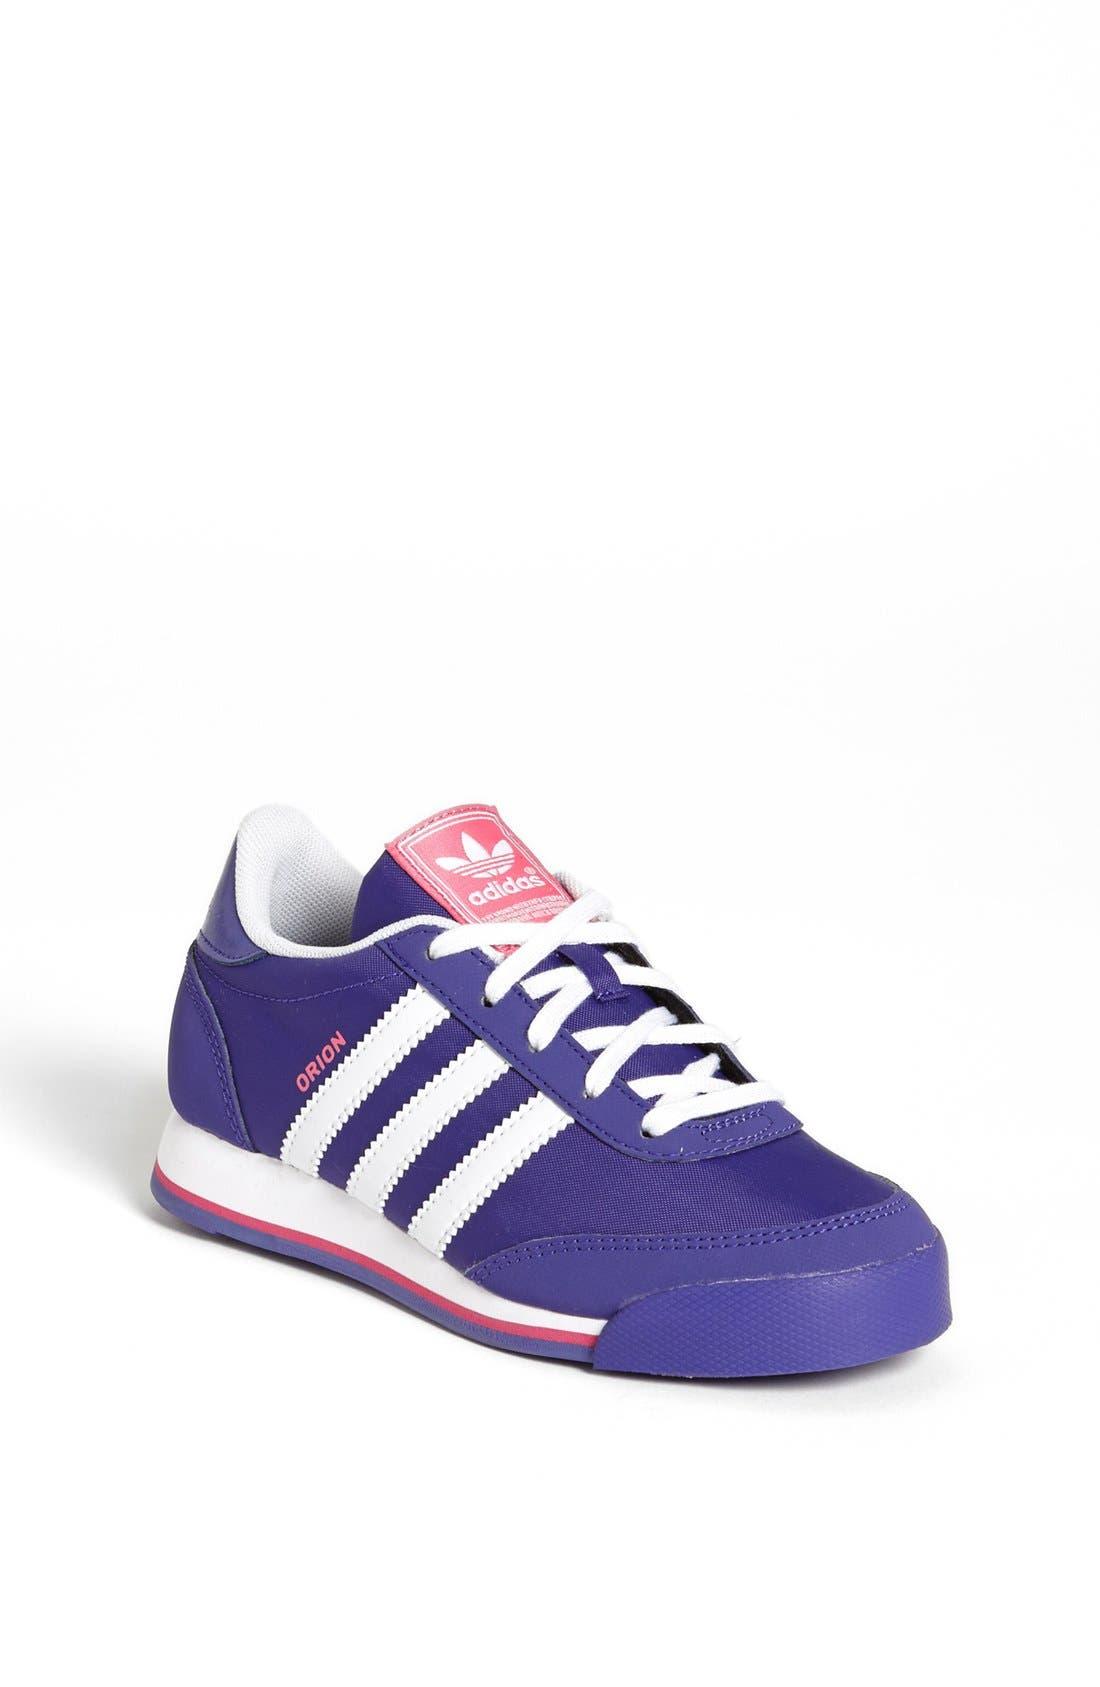 Alternate Image 1 Selected - adidas 'Orion 2' Sneaker (Walker, Toddler & Little Kid)